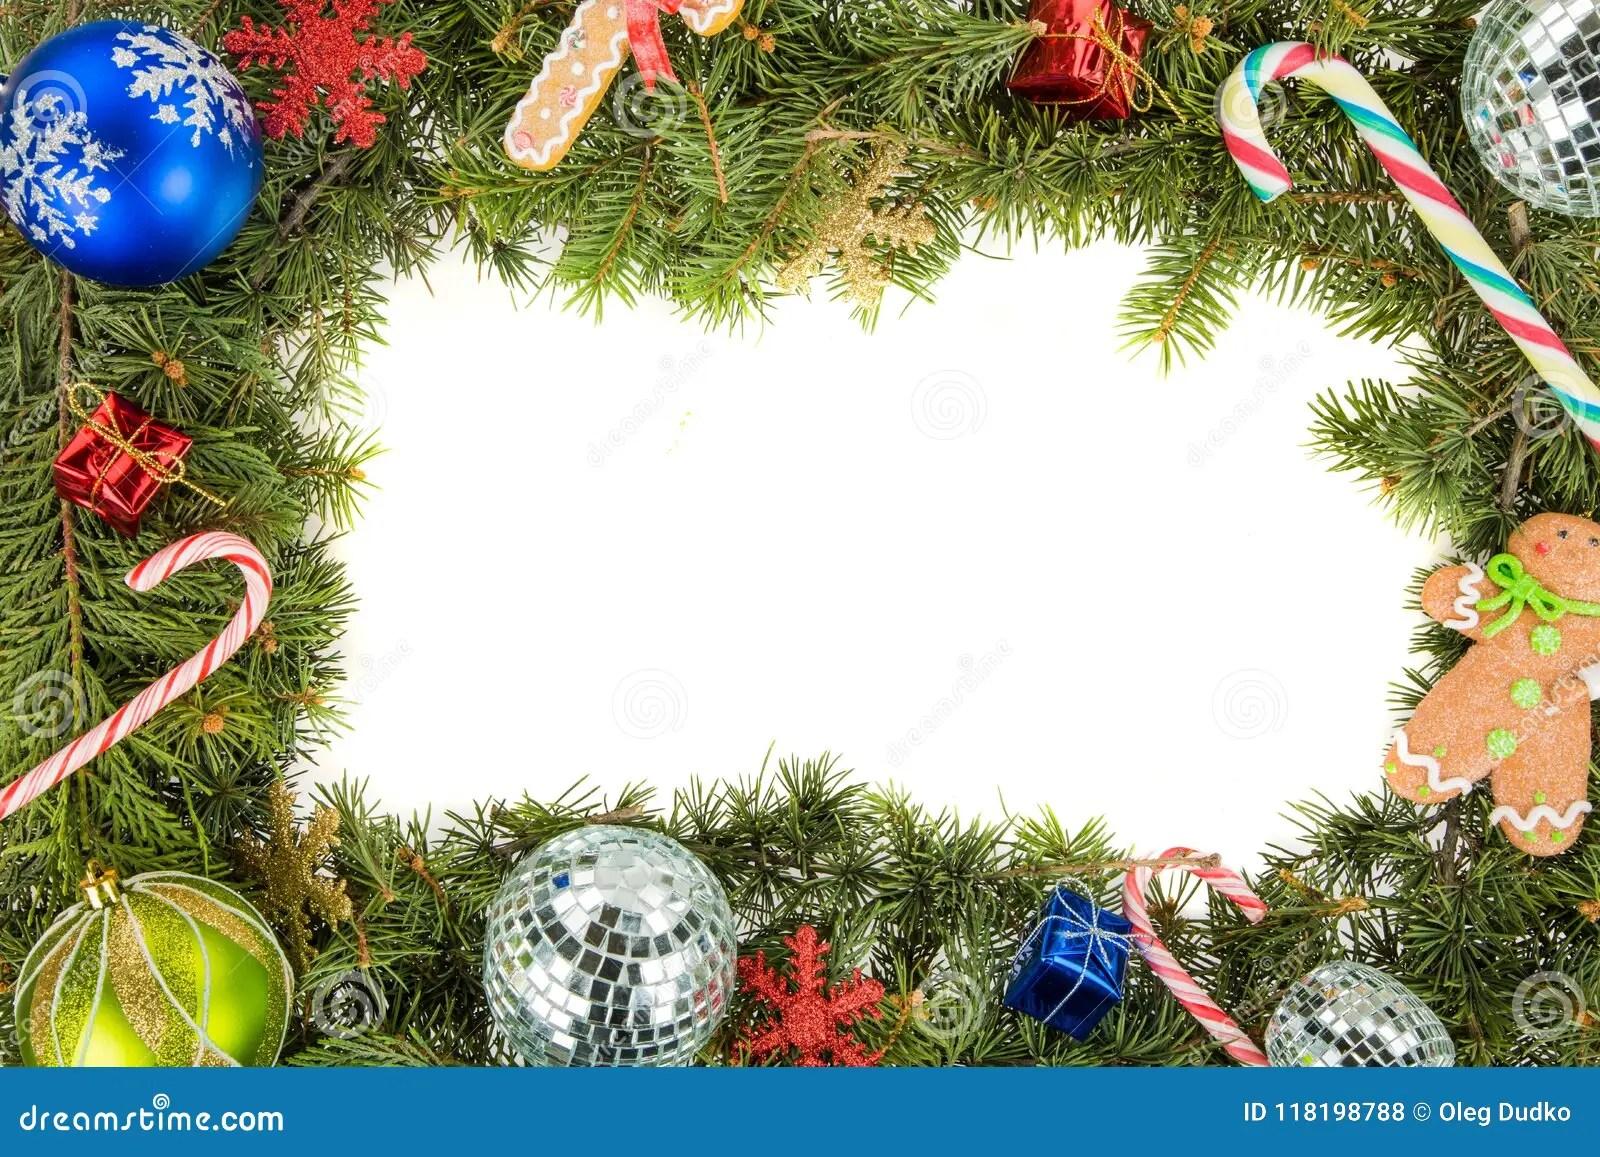 Christmas Wreath Border Stock Photo Image Of T